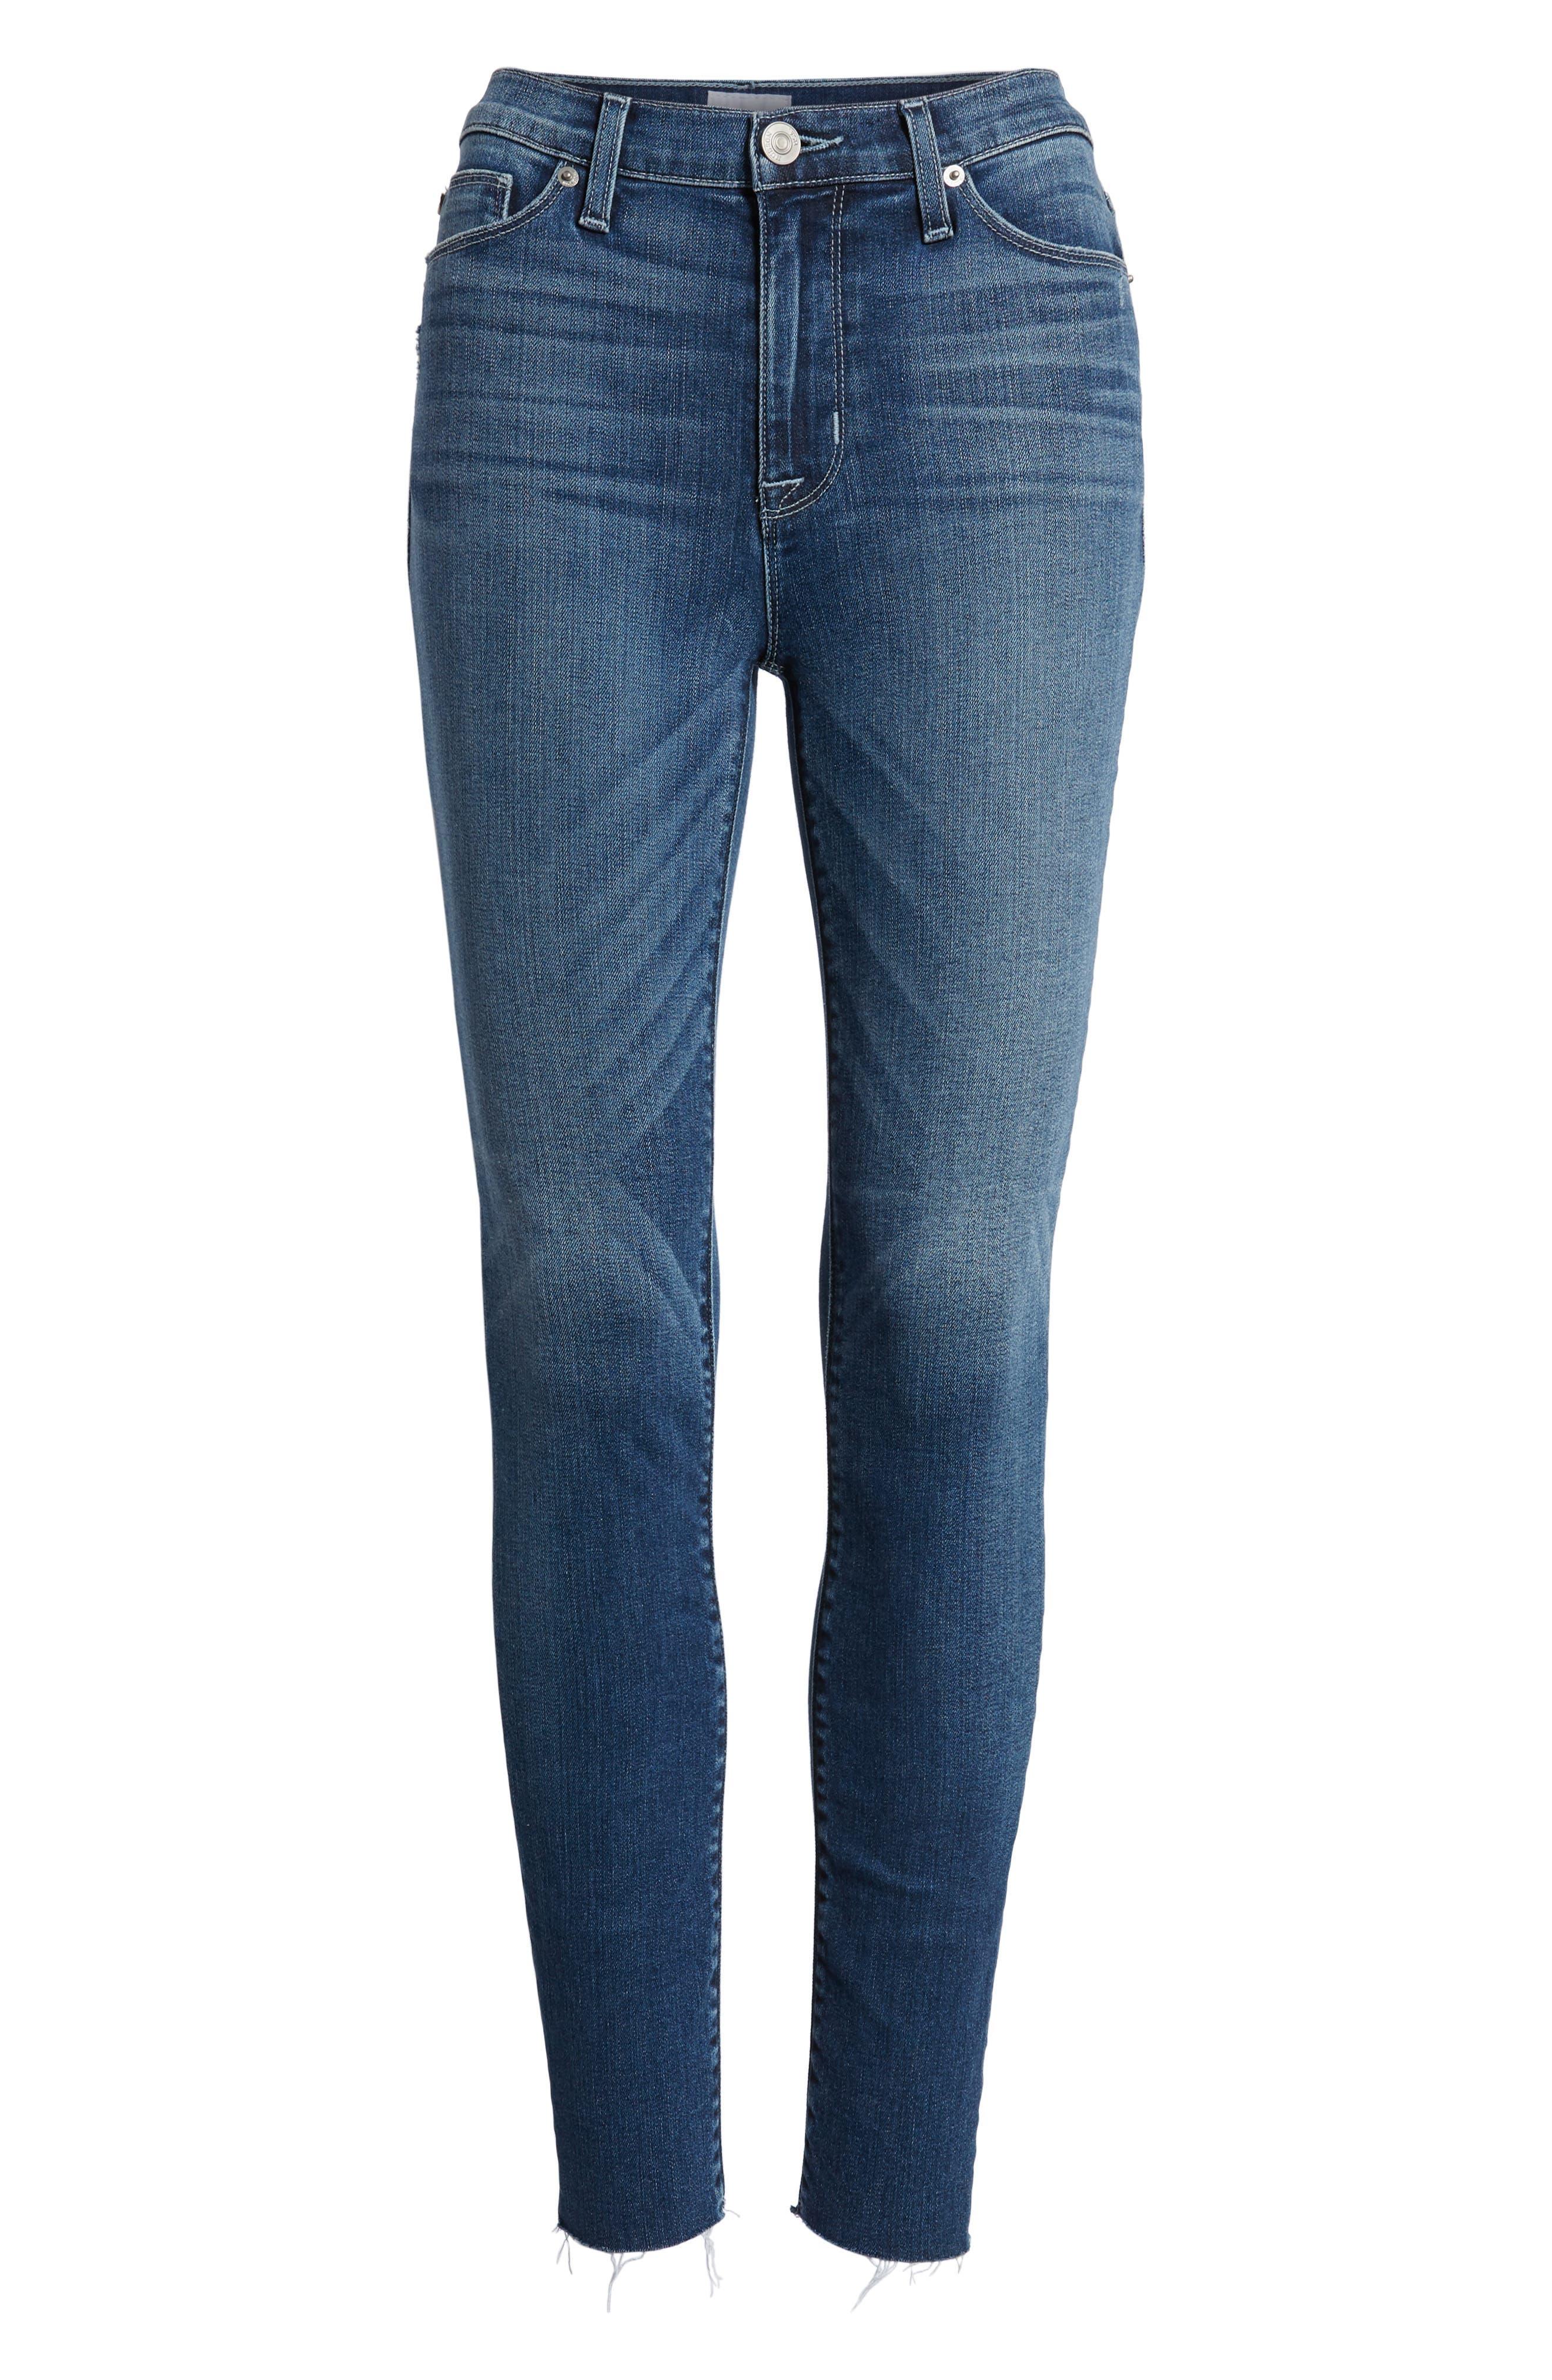 Hudson Barbara High Waist Ankle Skinny Jeans,                             Alternate thumbnail 7, color,                             CONTENDER